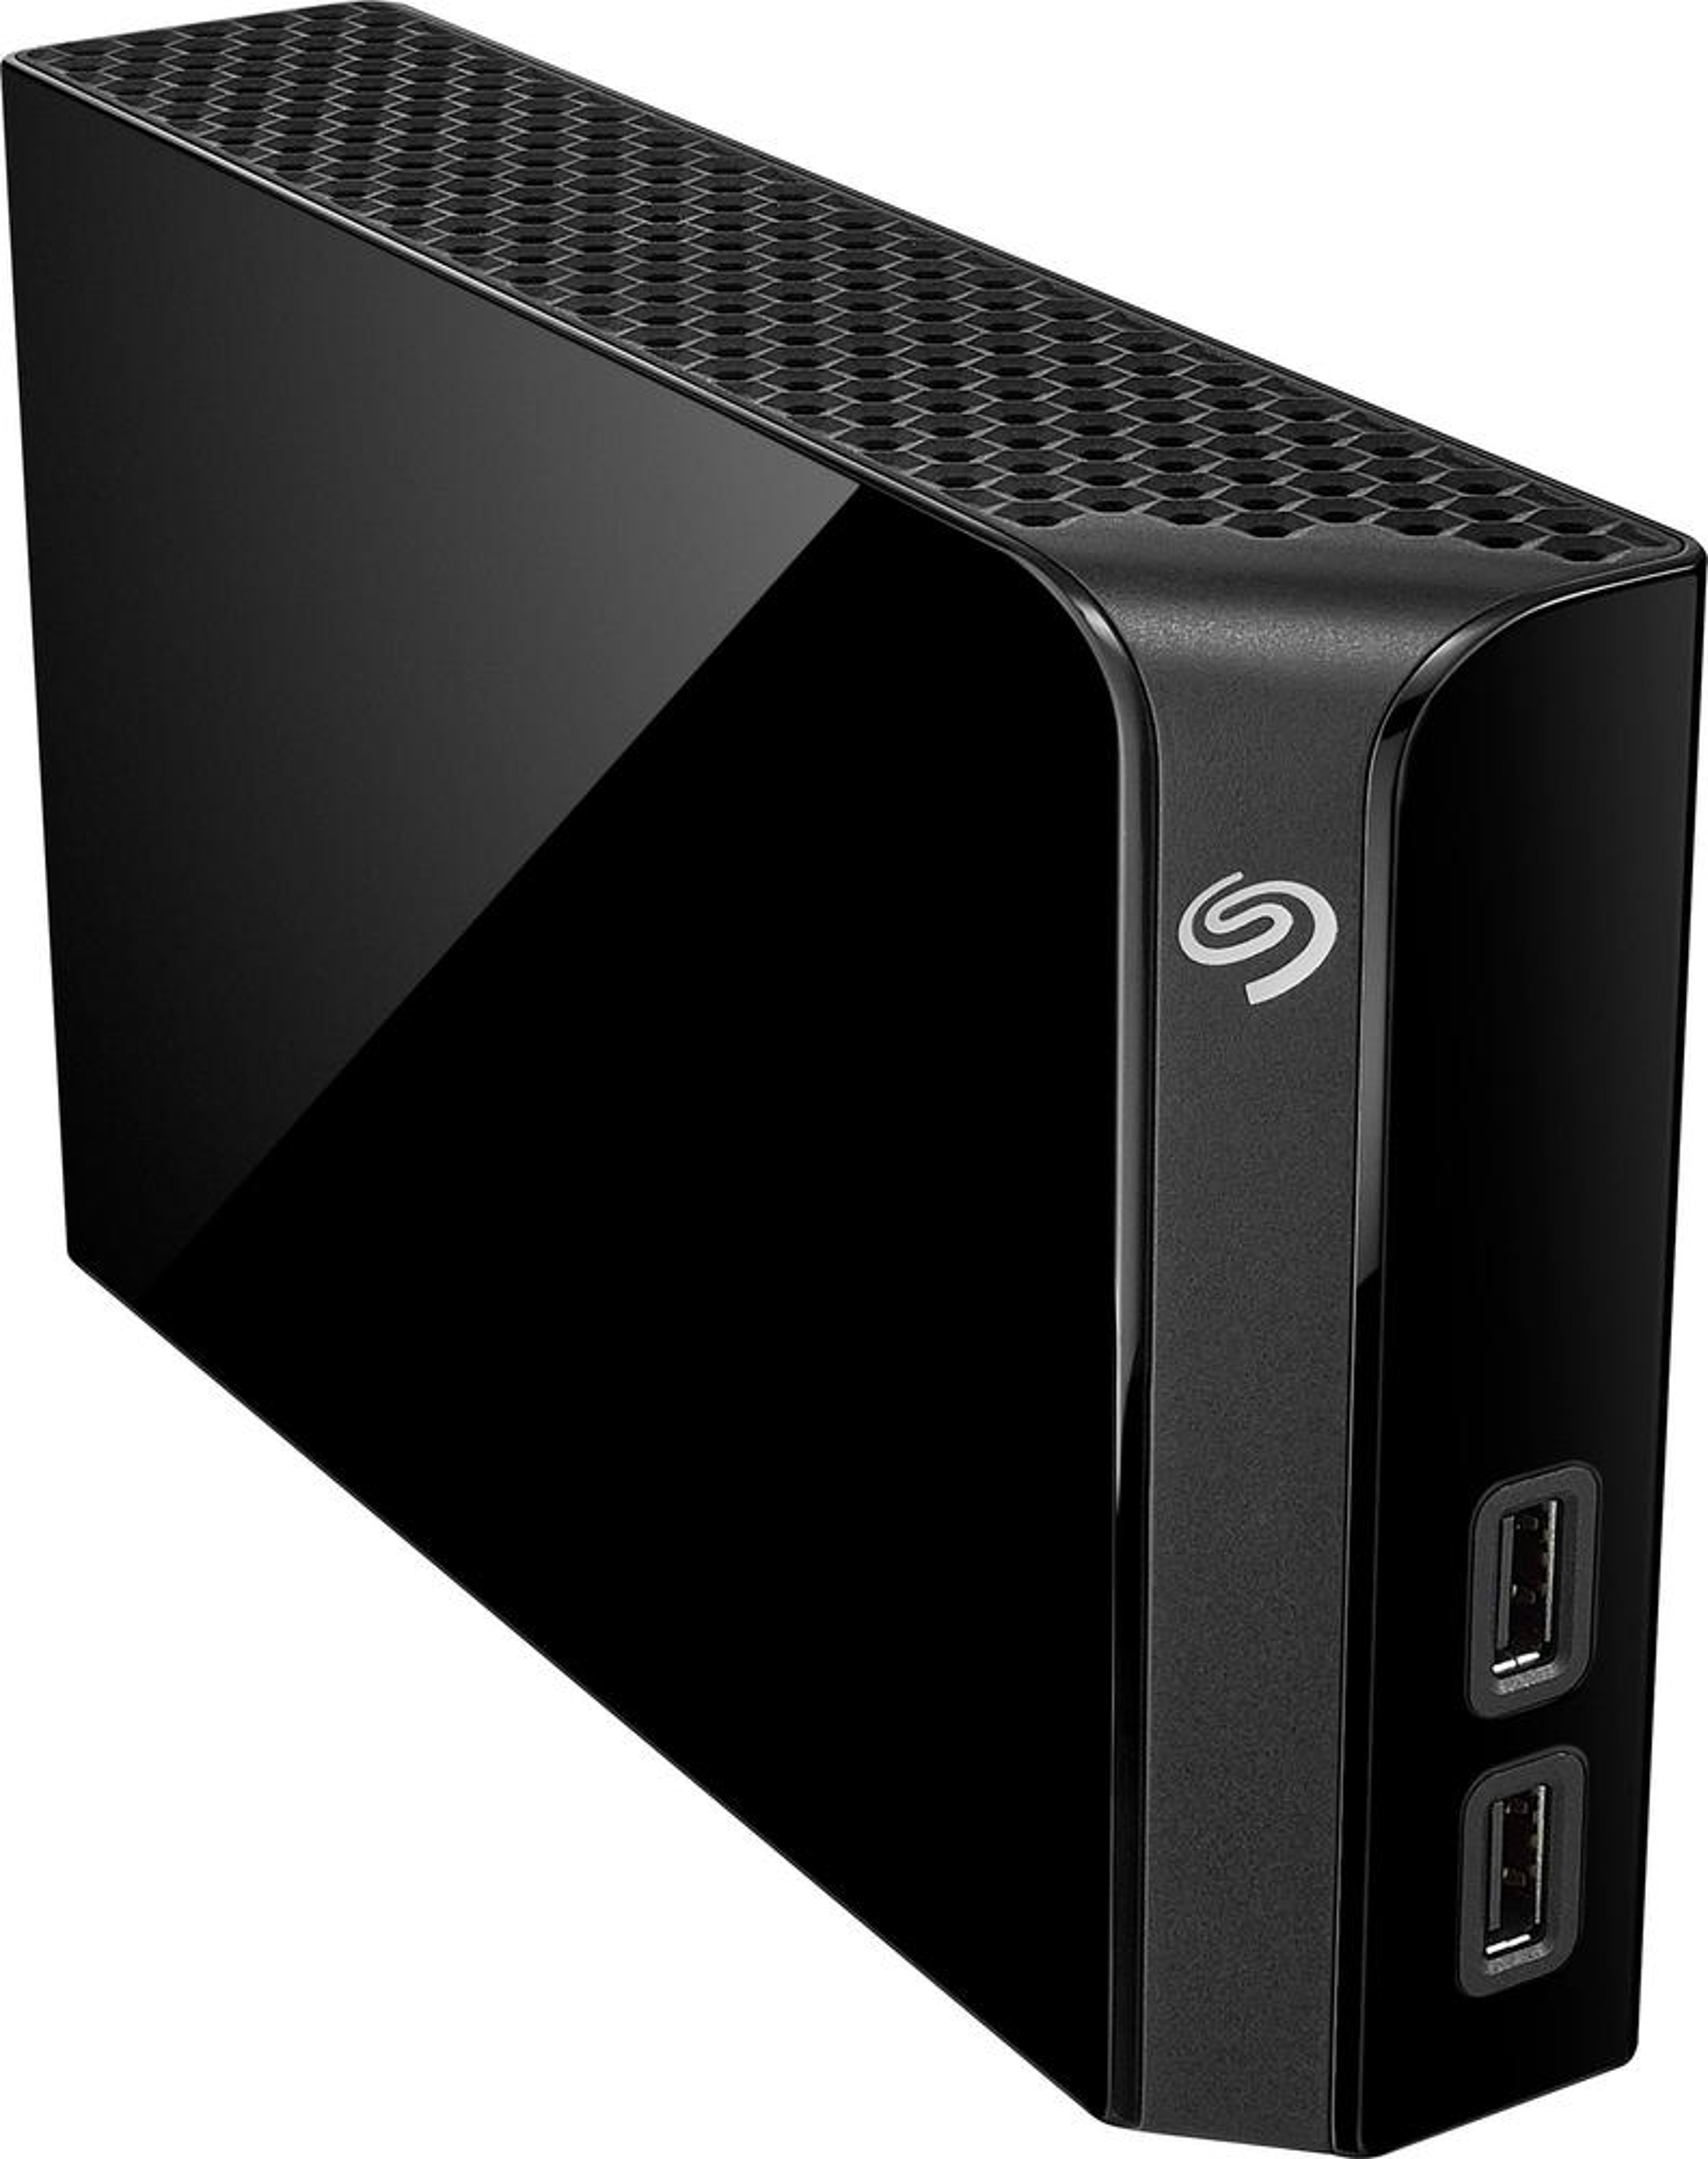 Seagate STEL6000100 Backup Plus Hub 6TB External USB 3.0 Portable Hard Drive Black